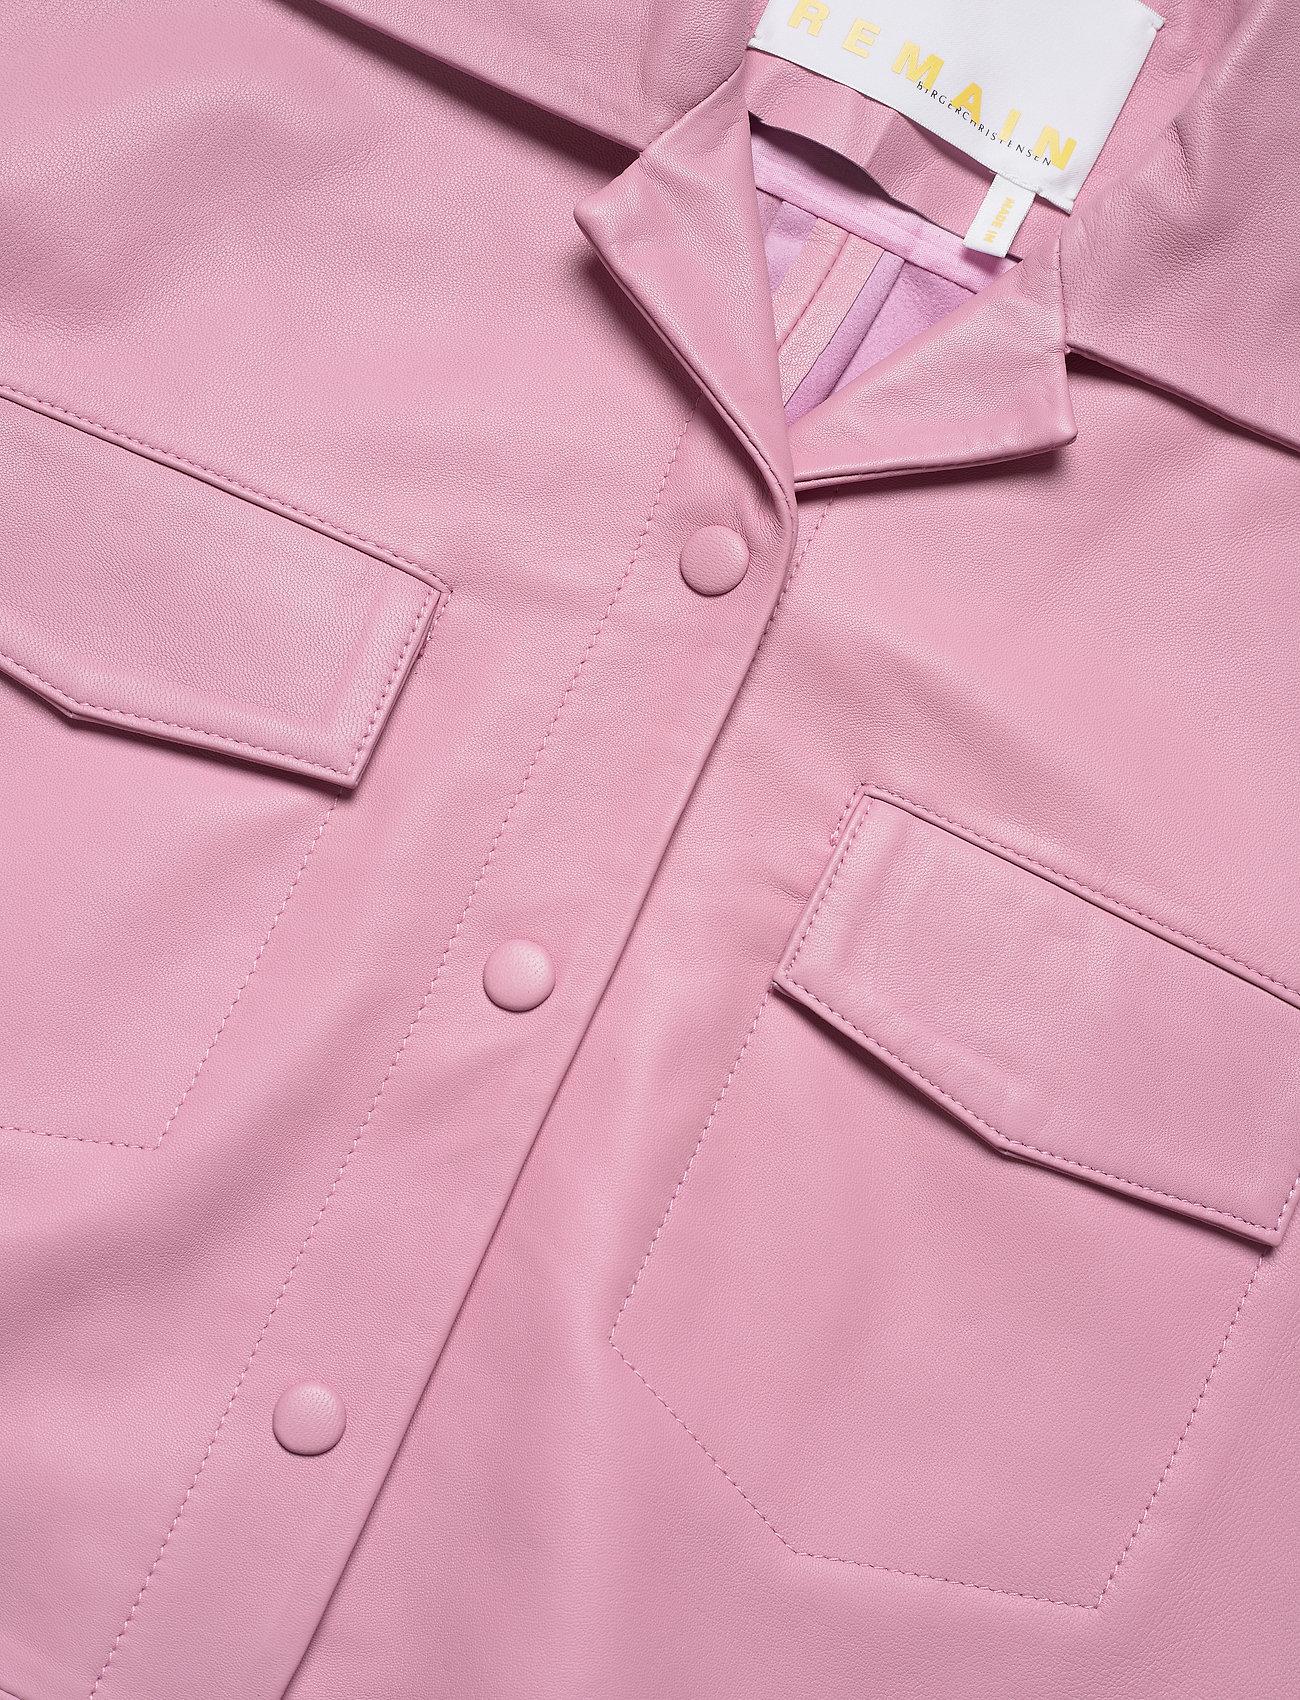 REMAIN Birger Christensen - Jocy Shirt Leather - denimskjorter - pink lavender - 2